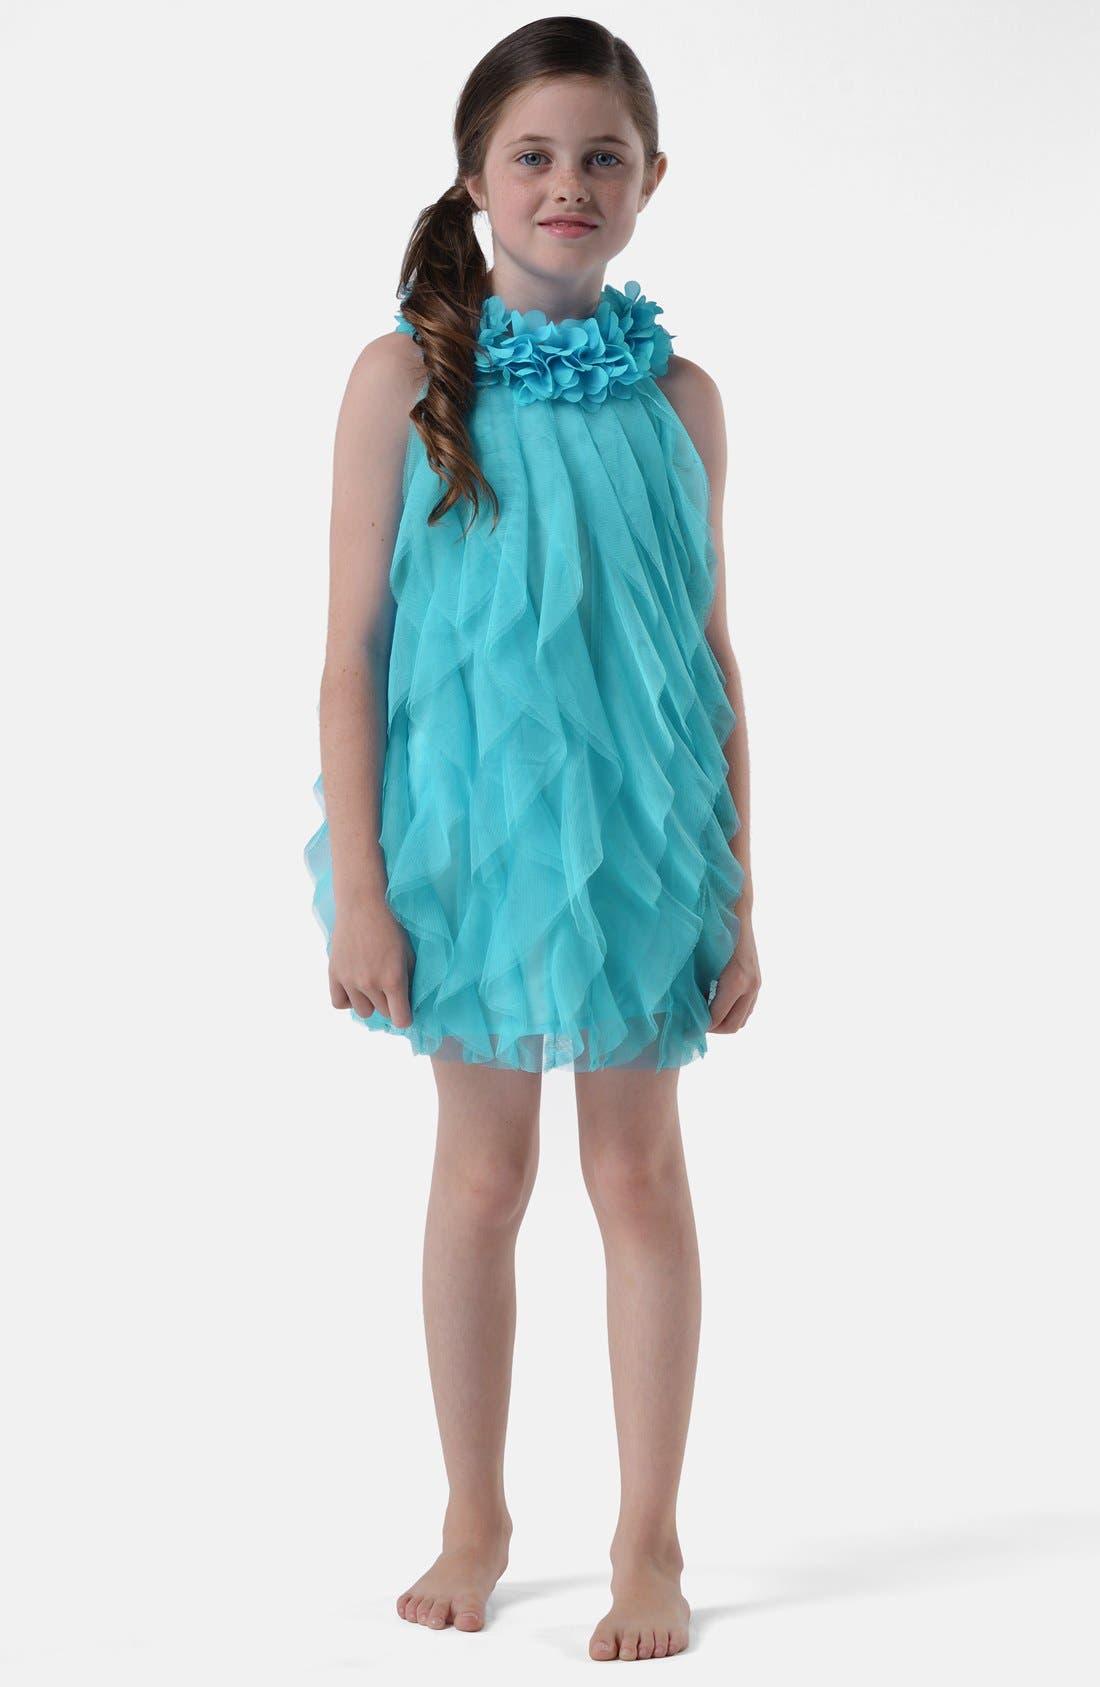 Alternate Image 1 Selected - Us Angels Ruffle Dress (Baby Girls, Toddler Girls, Little Girls & Big Girls)(Online Only)